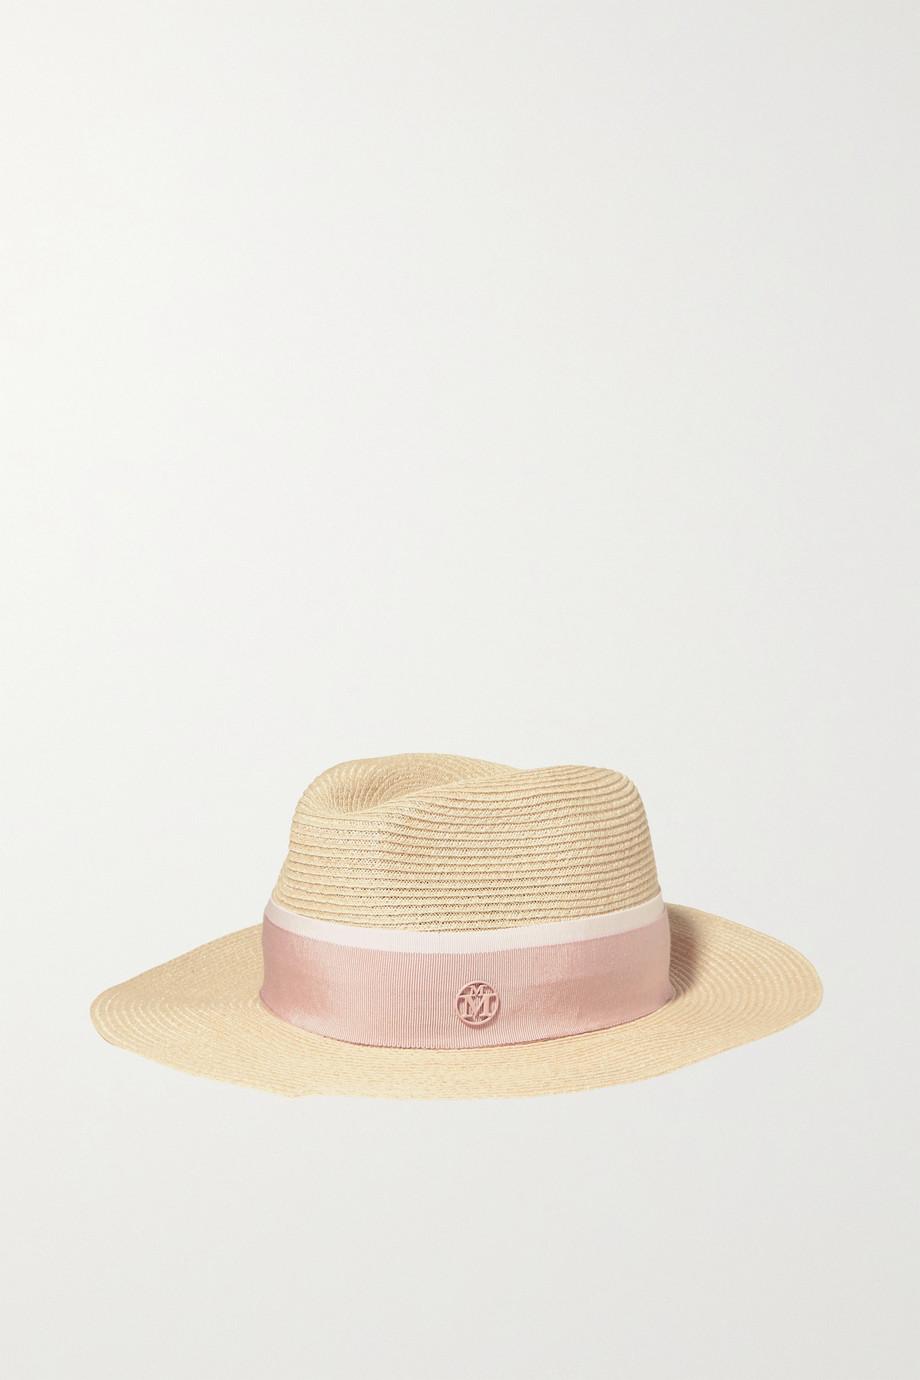 Maison Michel Henrietta 罗缎边饰编织草帽